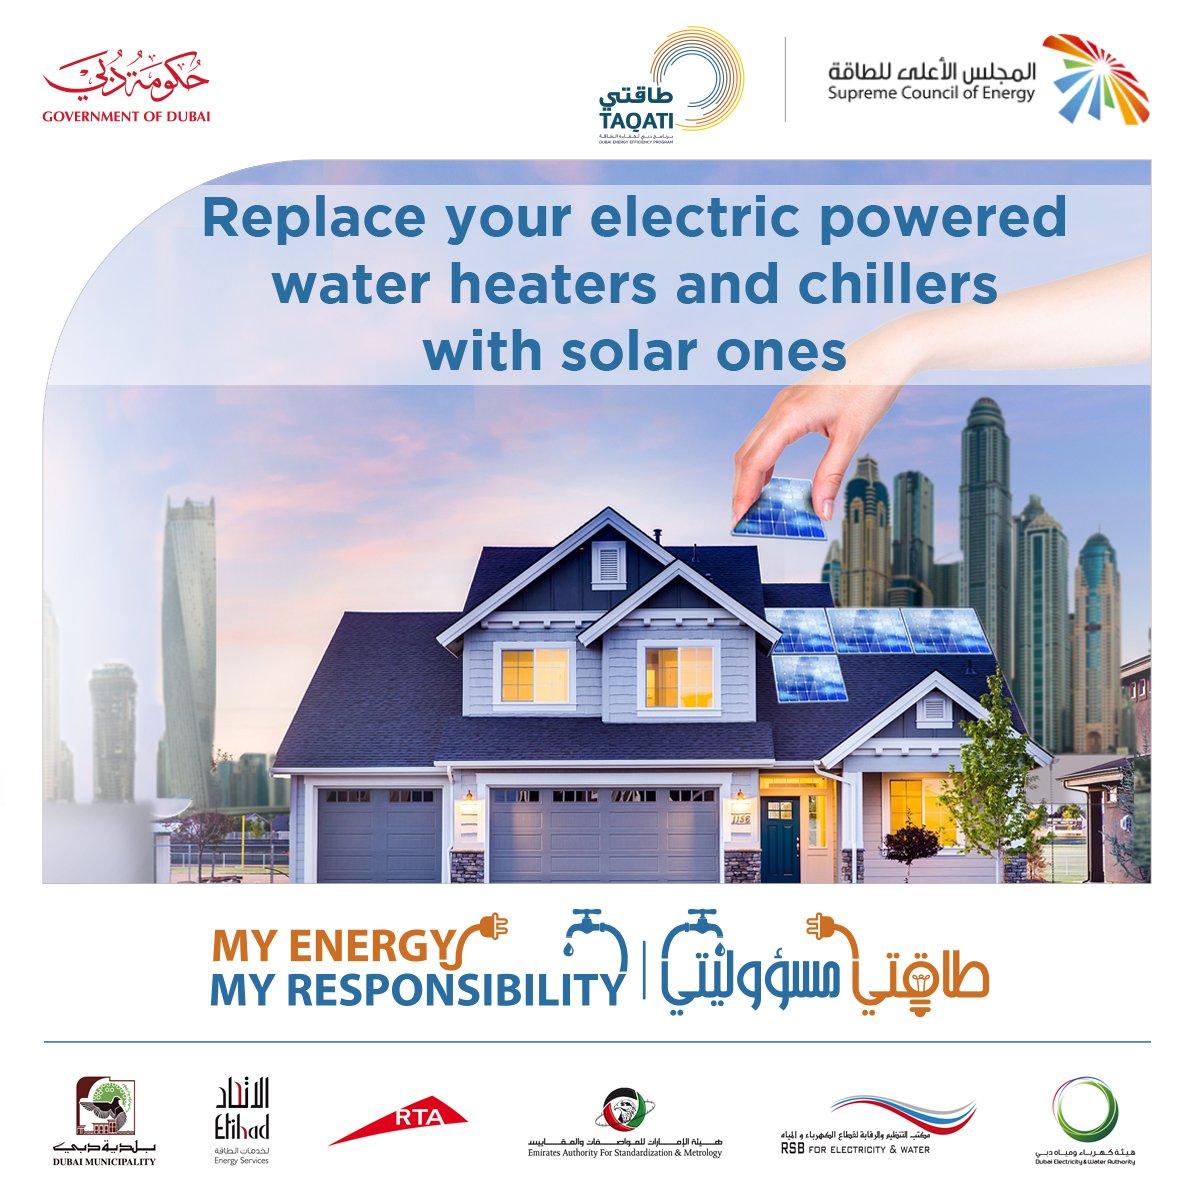 TAQATI | Dubai Energy Efficiency Program on Twitter: